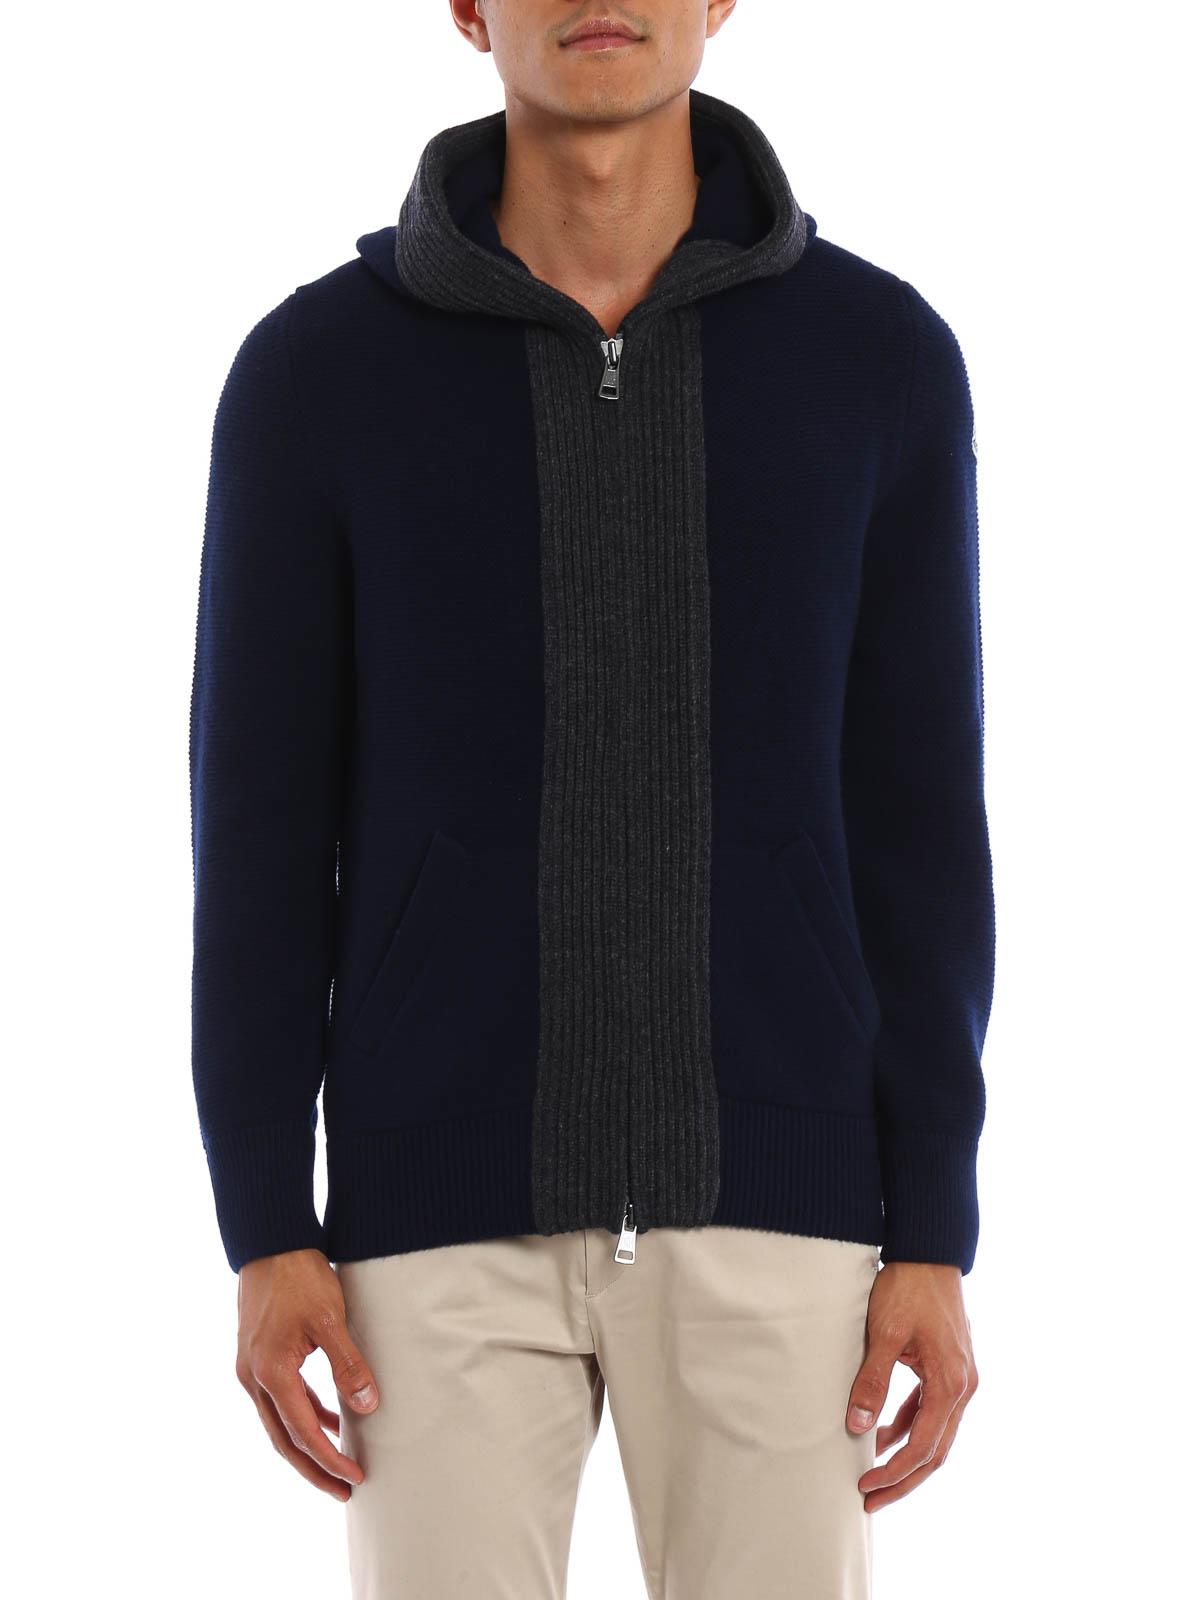 Virgin wool hooded cardigan by Moncler - cardigans | iKRIX